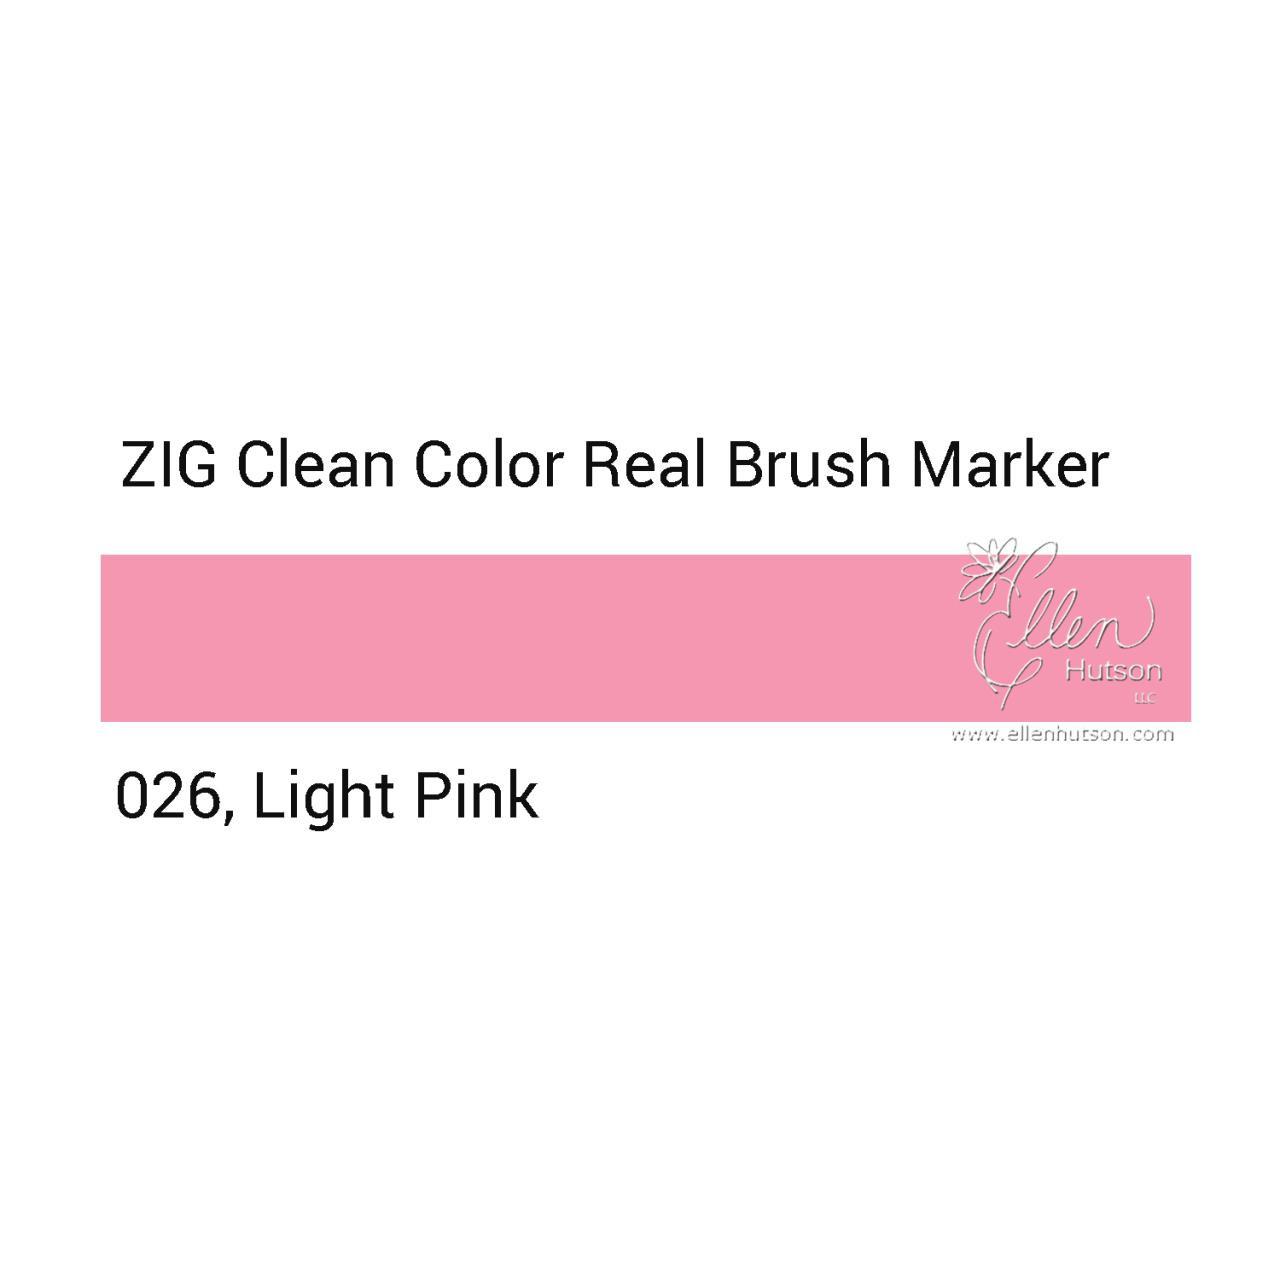 026 - Light Pink, ZIG Clean Color Real Brush Marker -